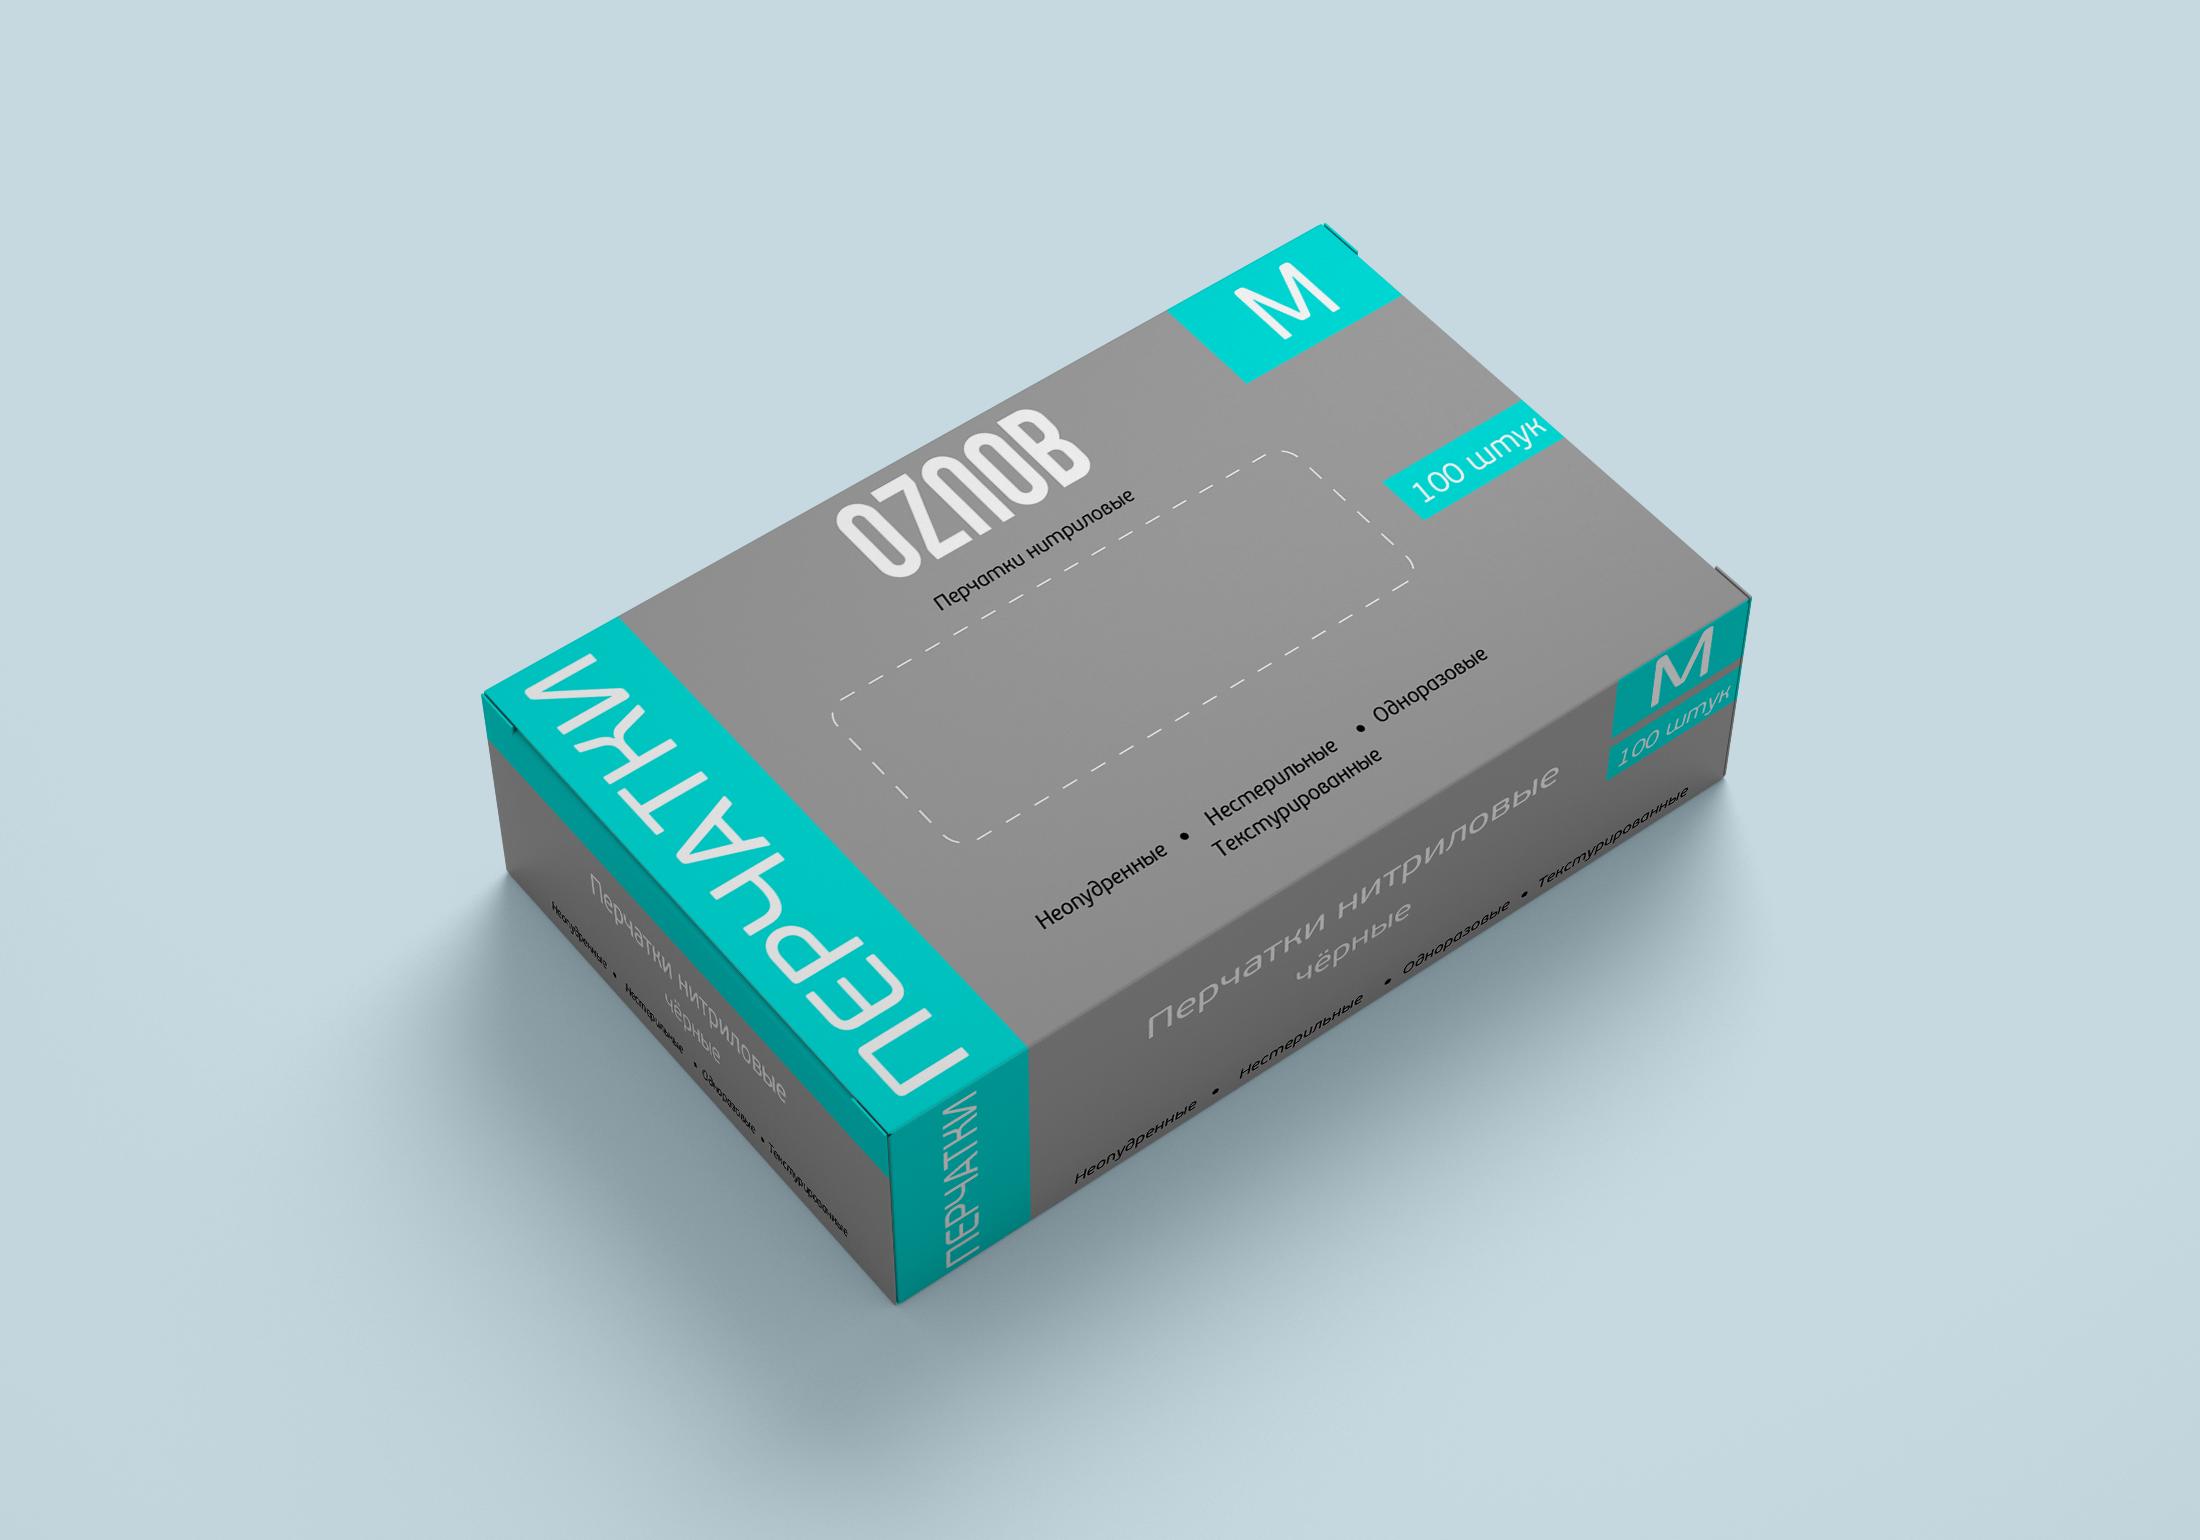 дизайн упаковки (коробка размером 250*150*60 мм)для перчаток фото f_4135ef08dcba206e.png